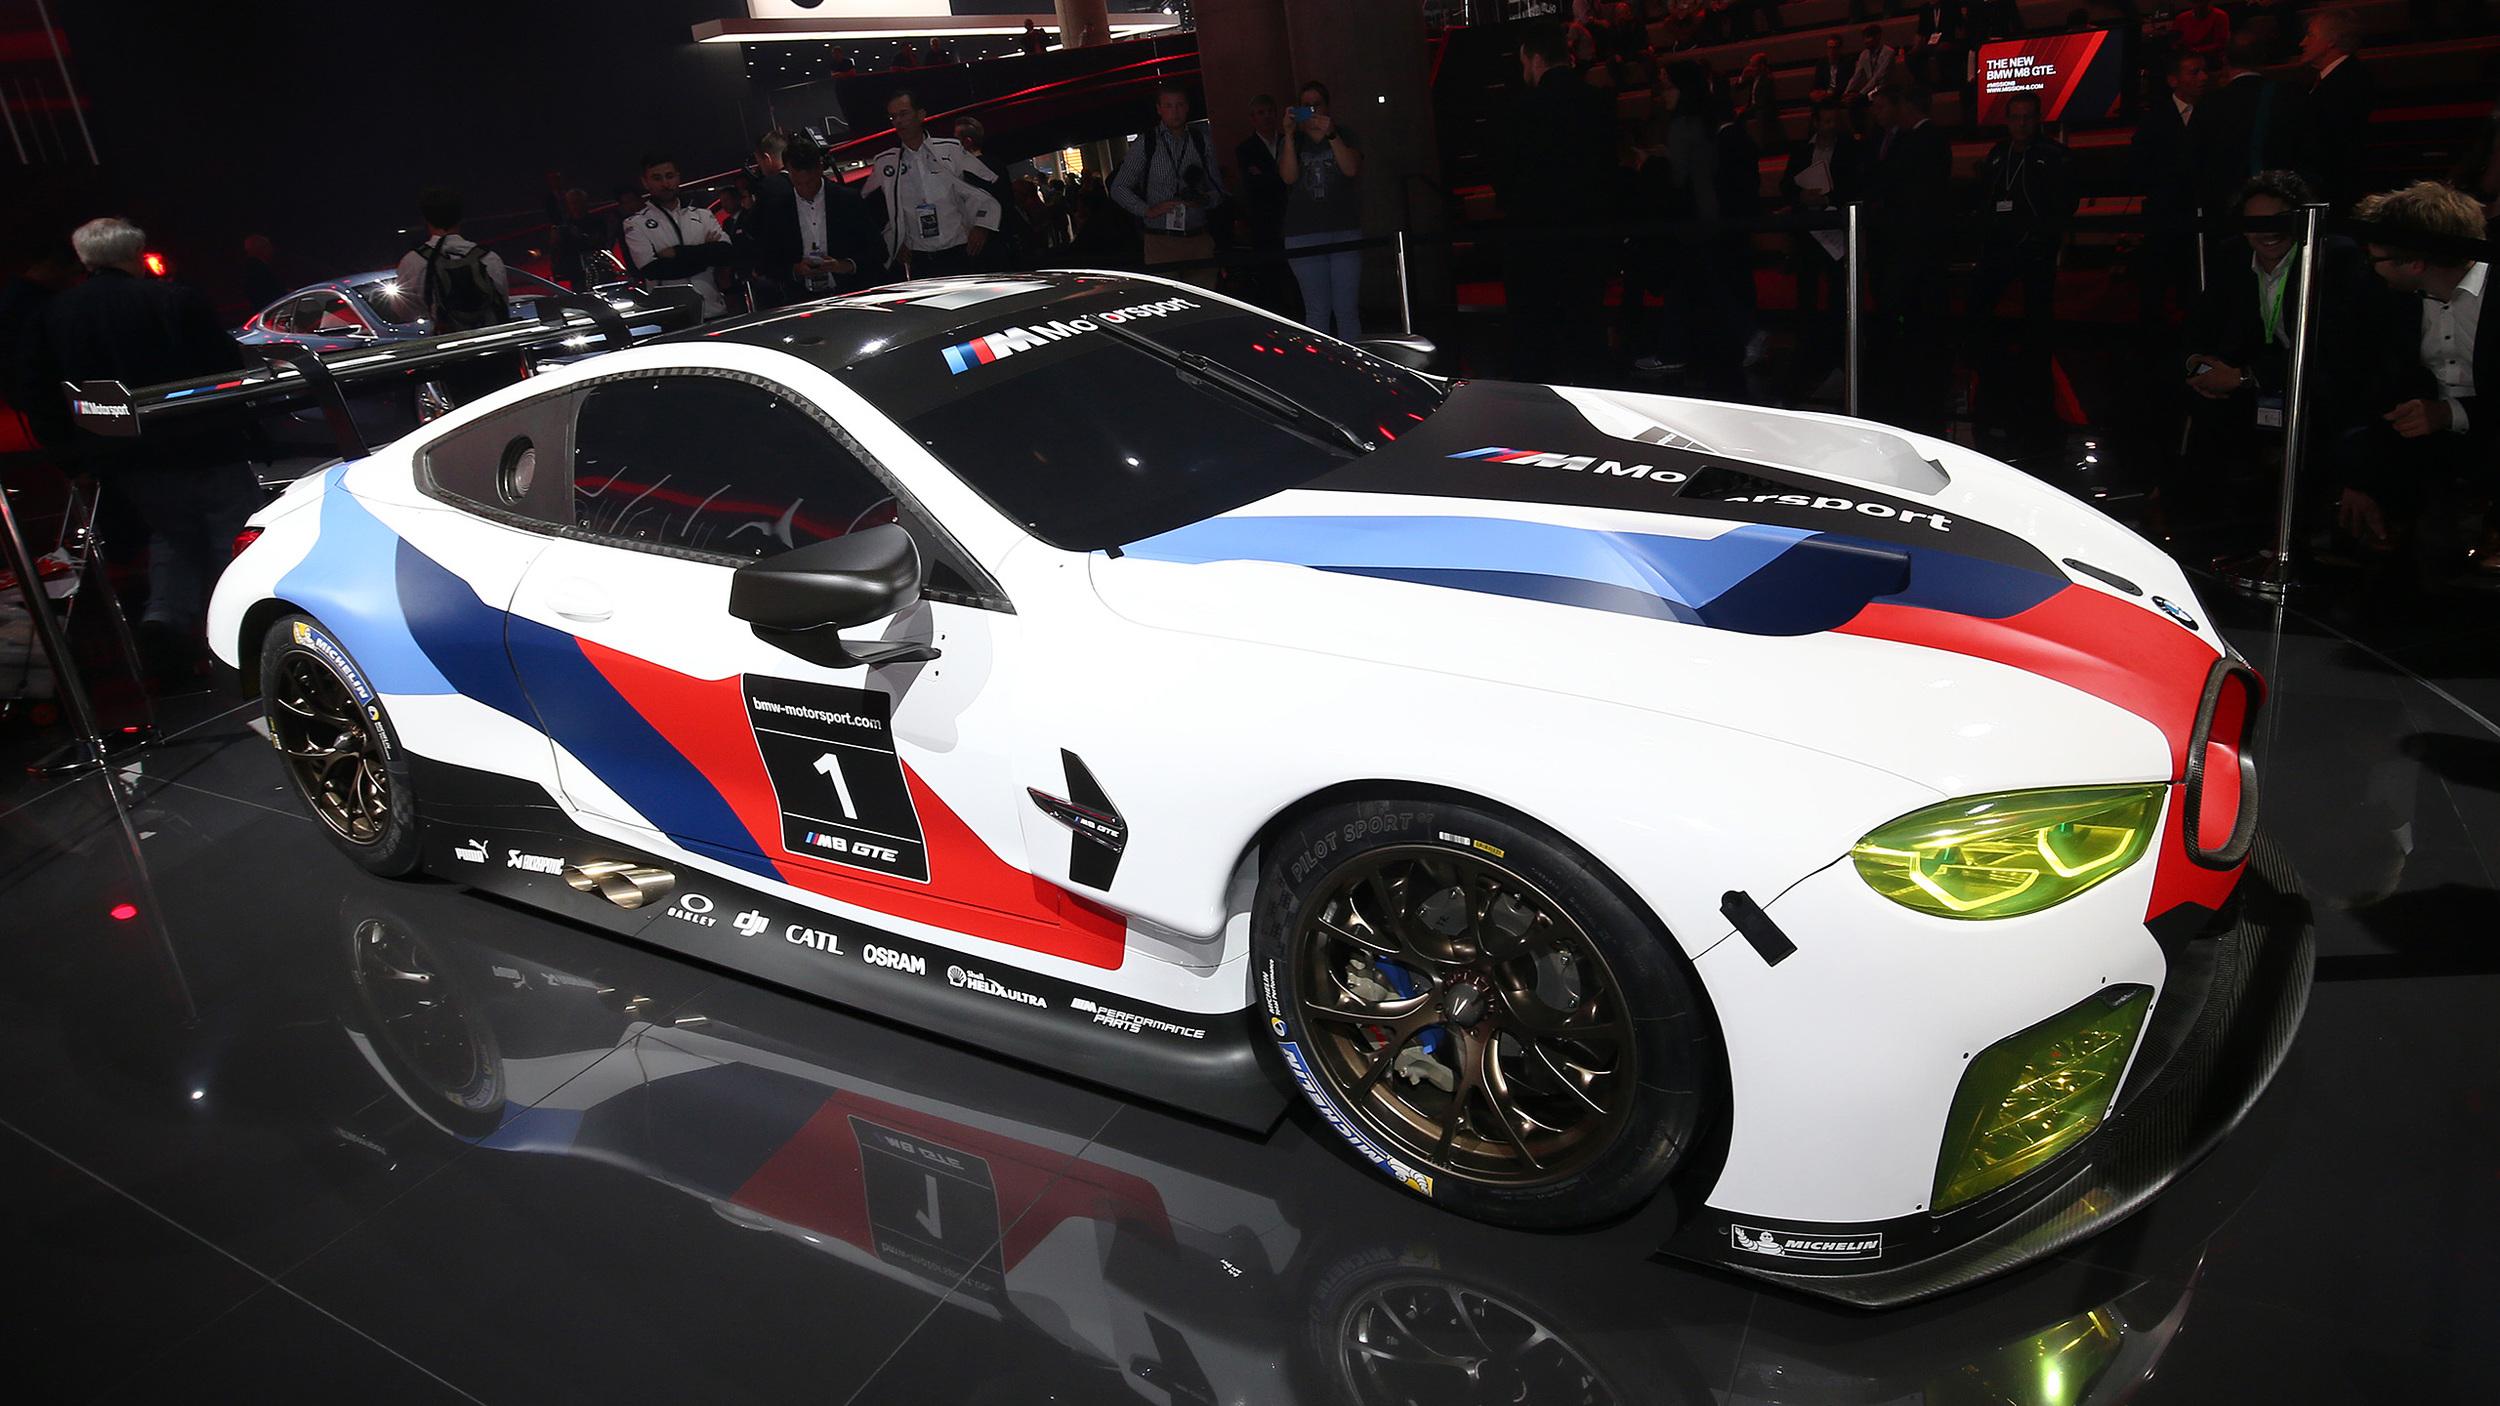 BMW、次期型「M8」のレース用車両を公開 ル・マン24時間レースにも復帰